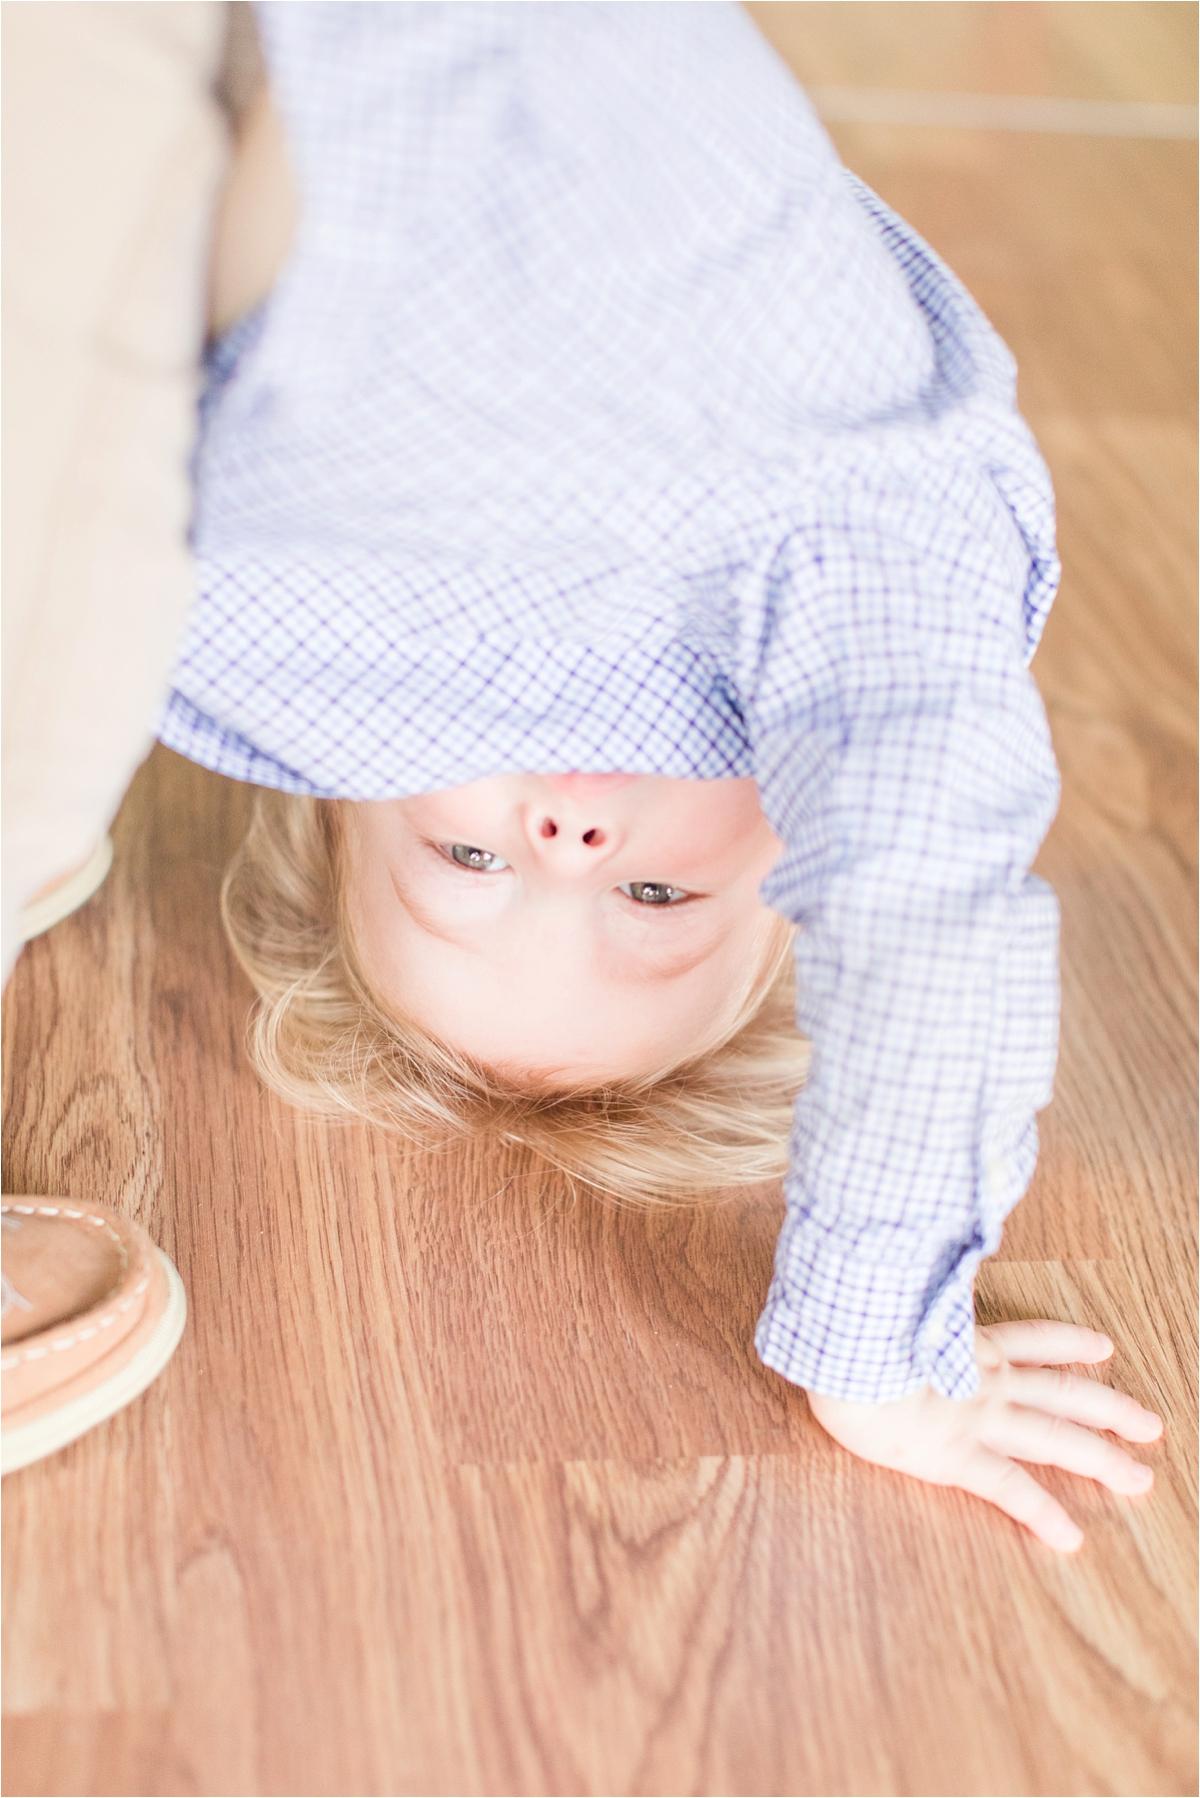 alabama-family-portrait-photographer-family of three-ideas-toddler-son-boy